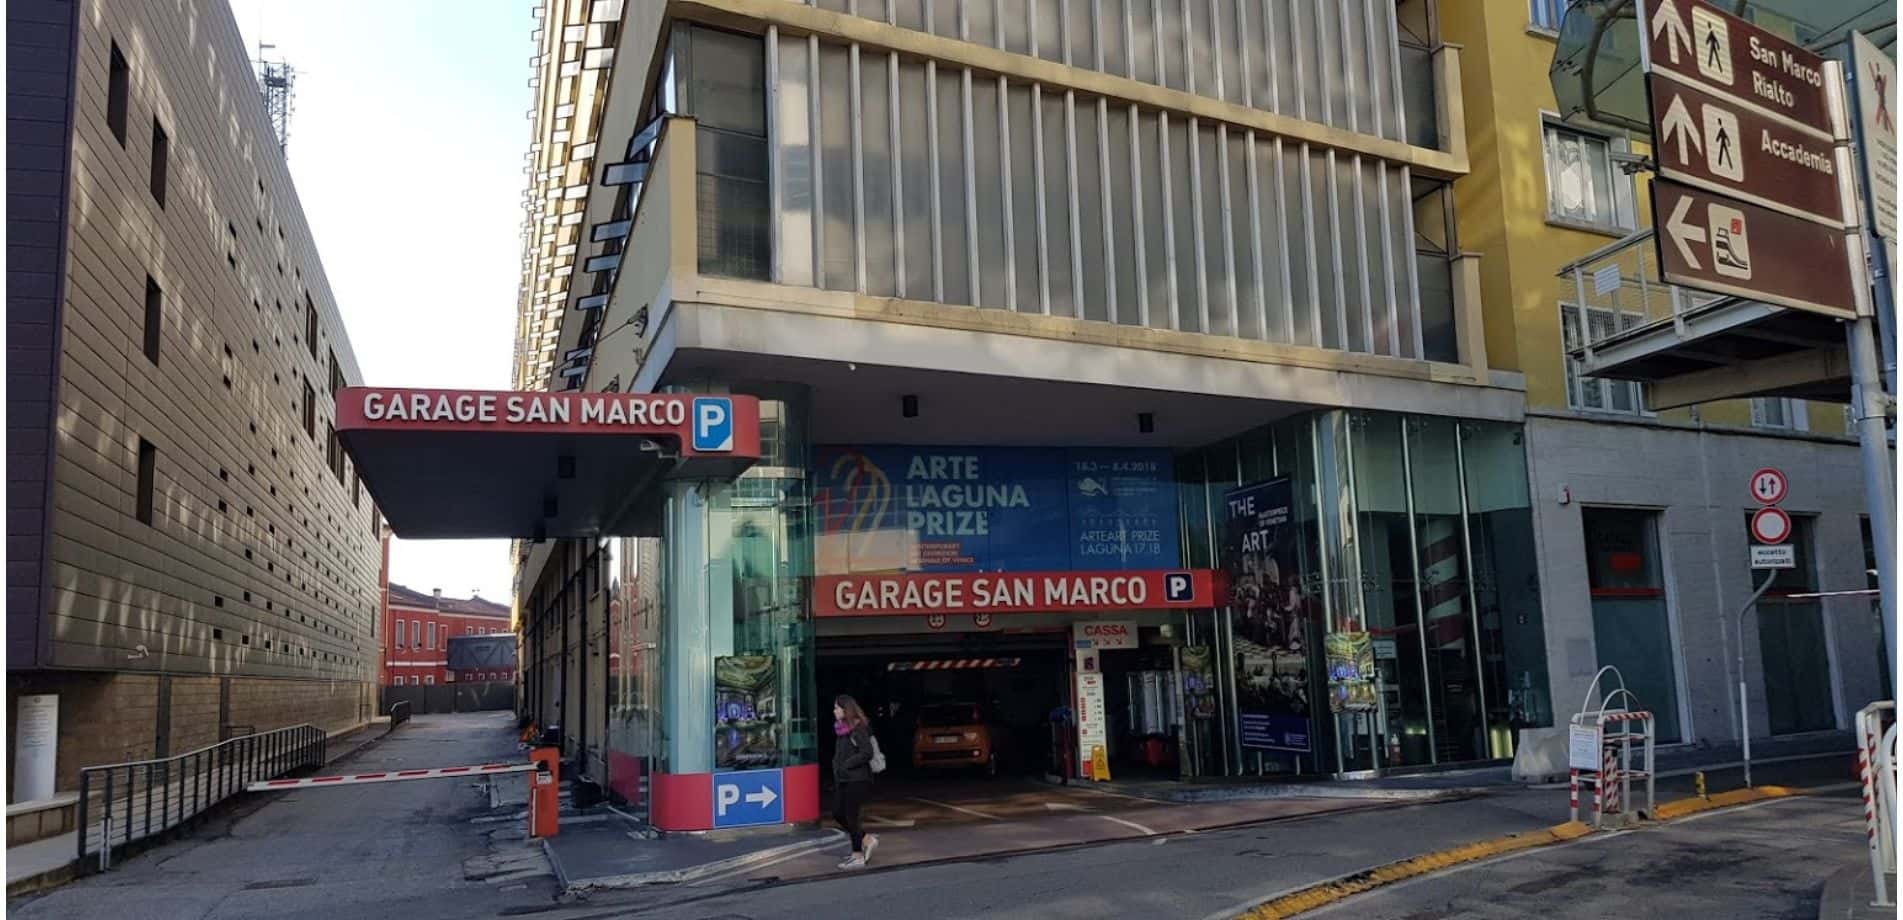 Garage San Marco